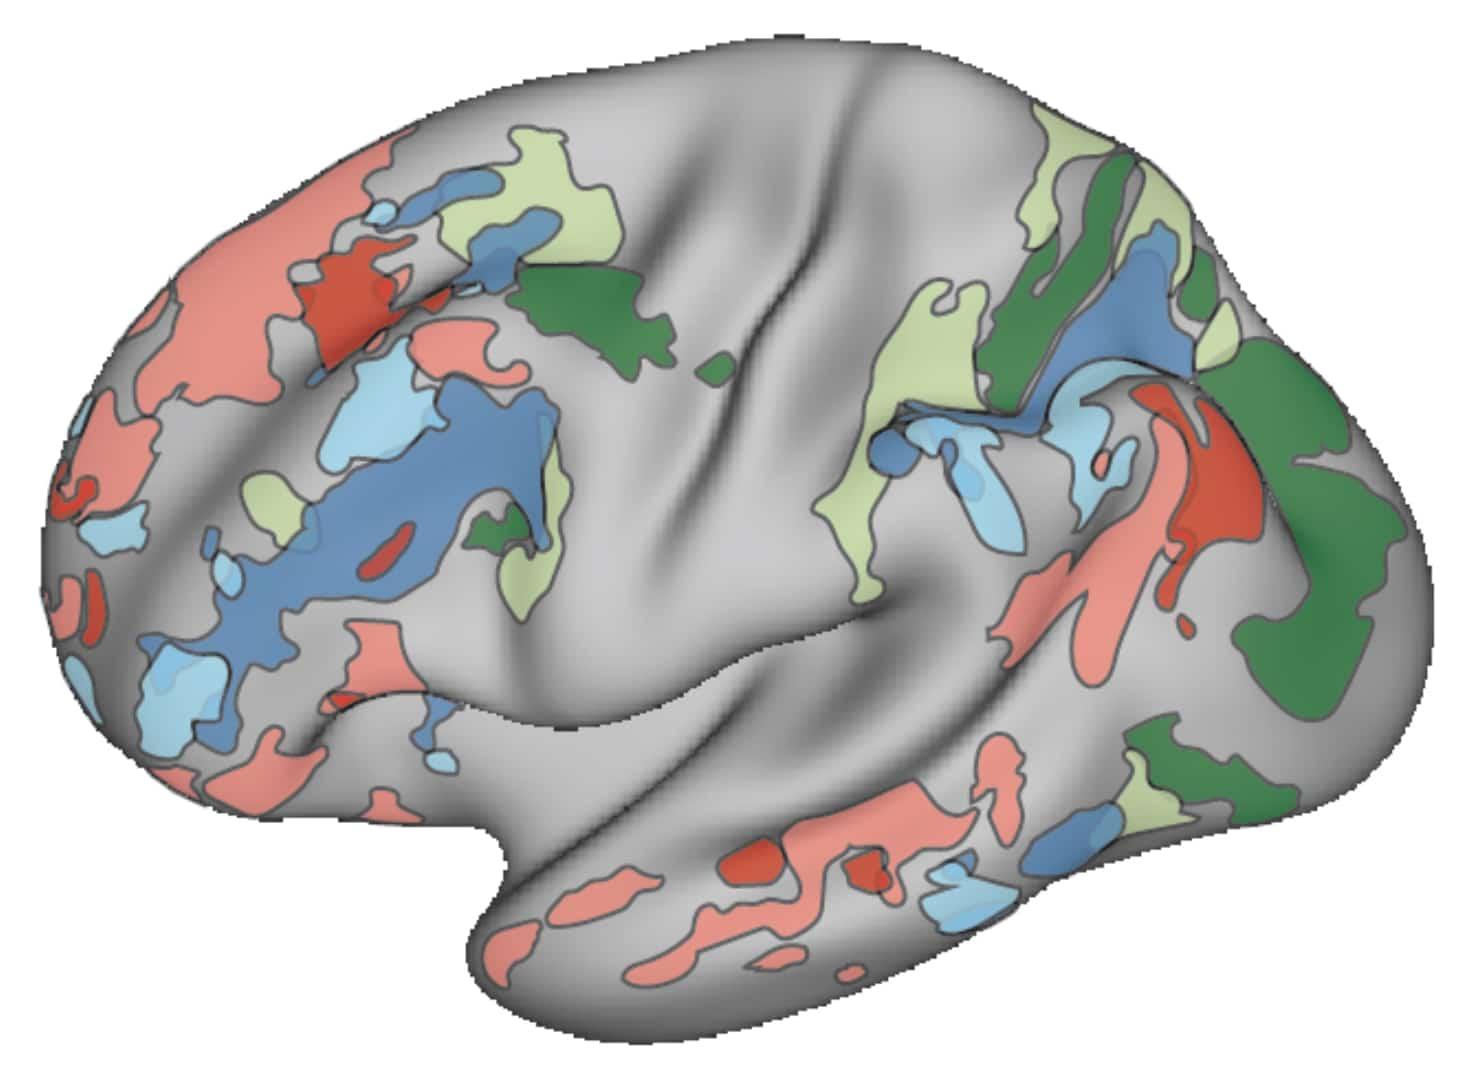 Buckner Brain MRI Image Crop